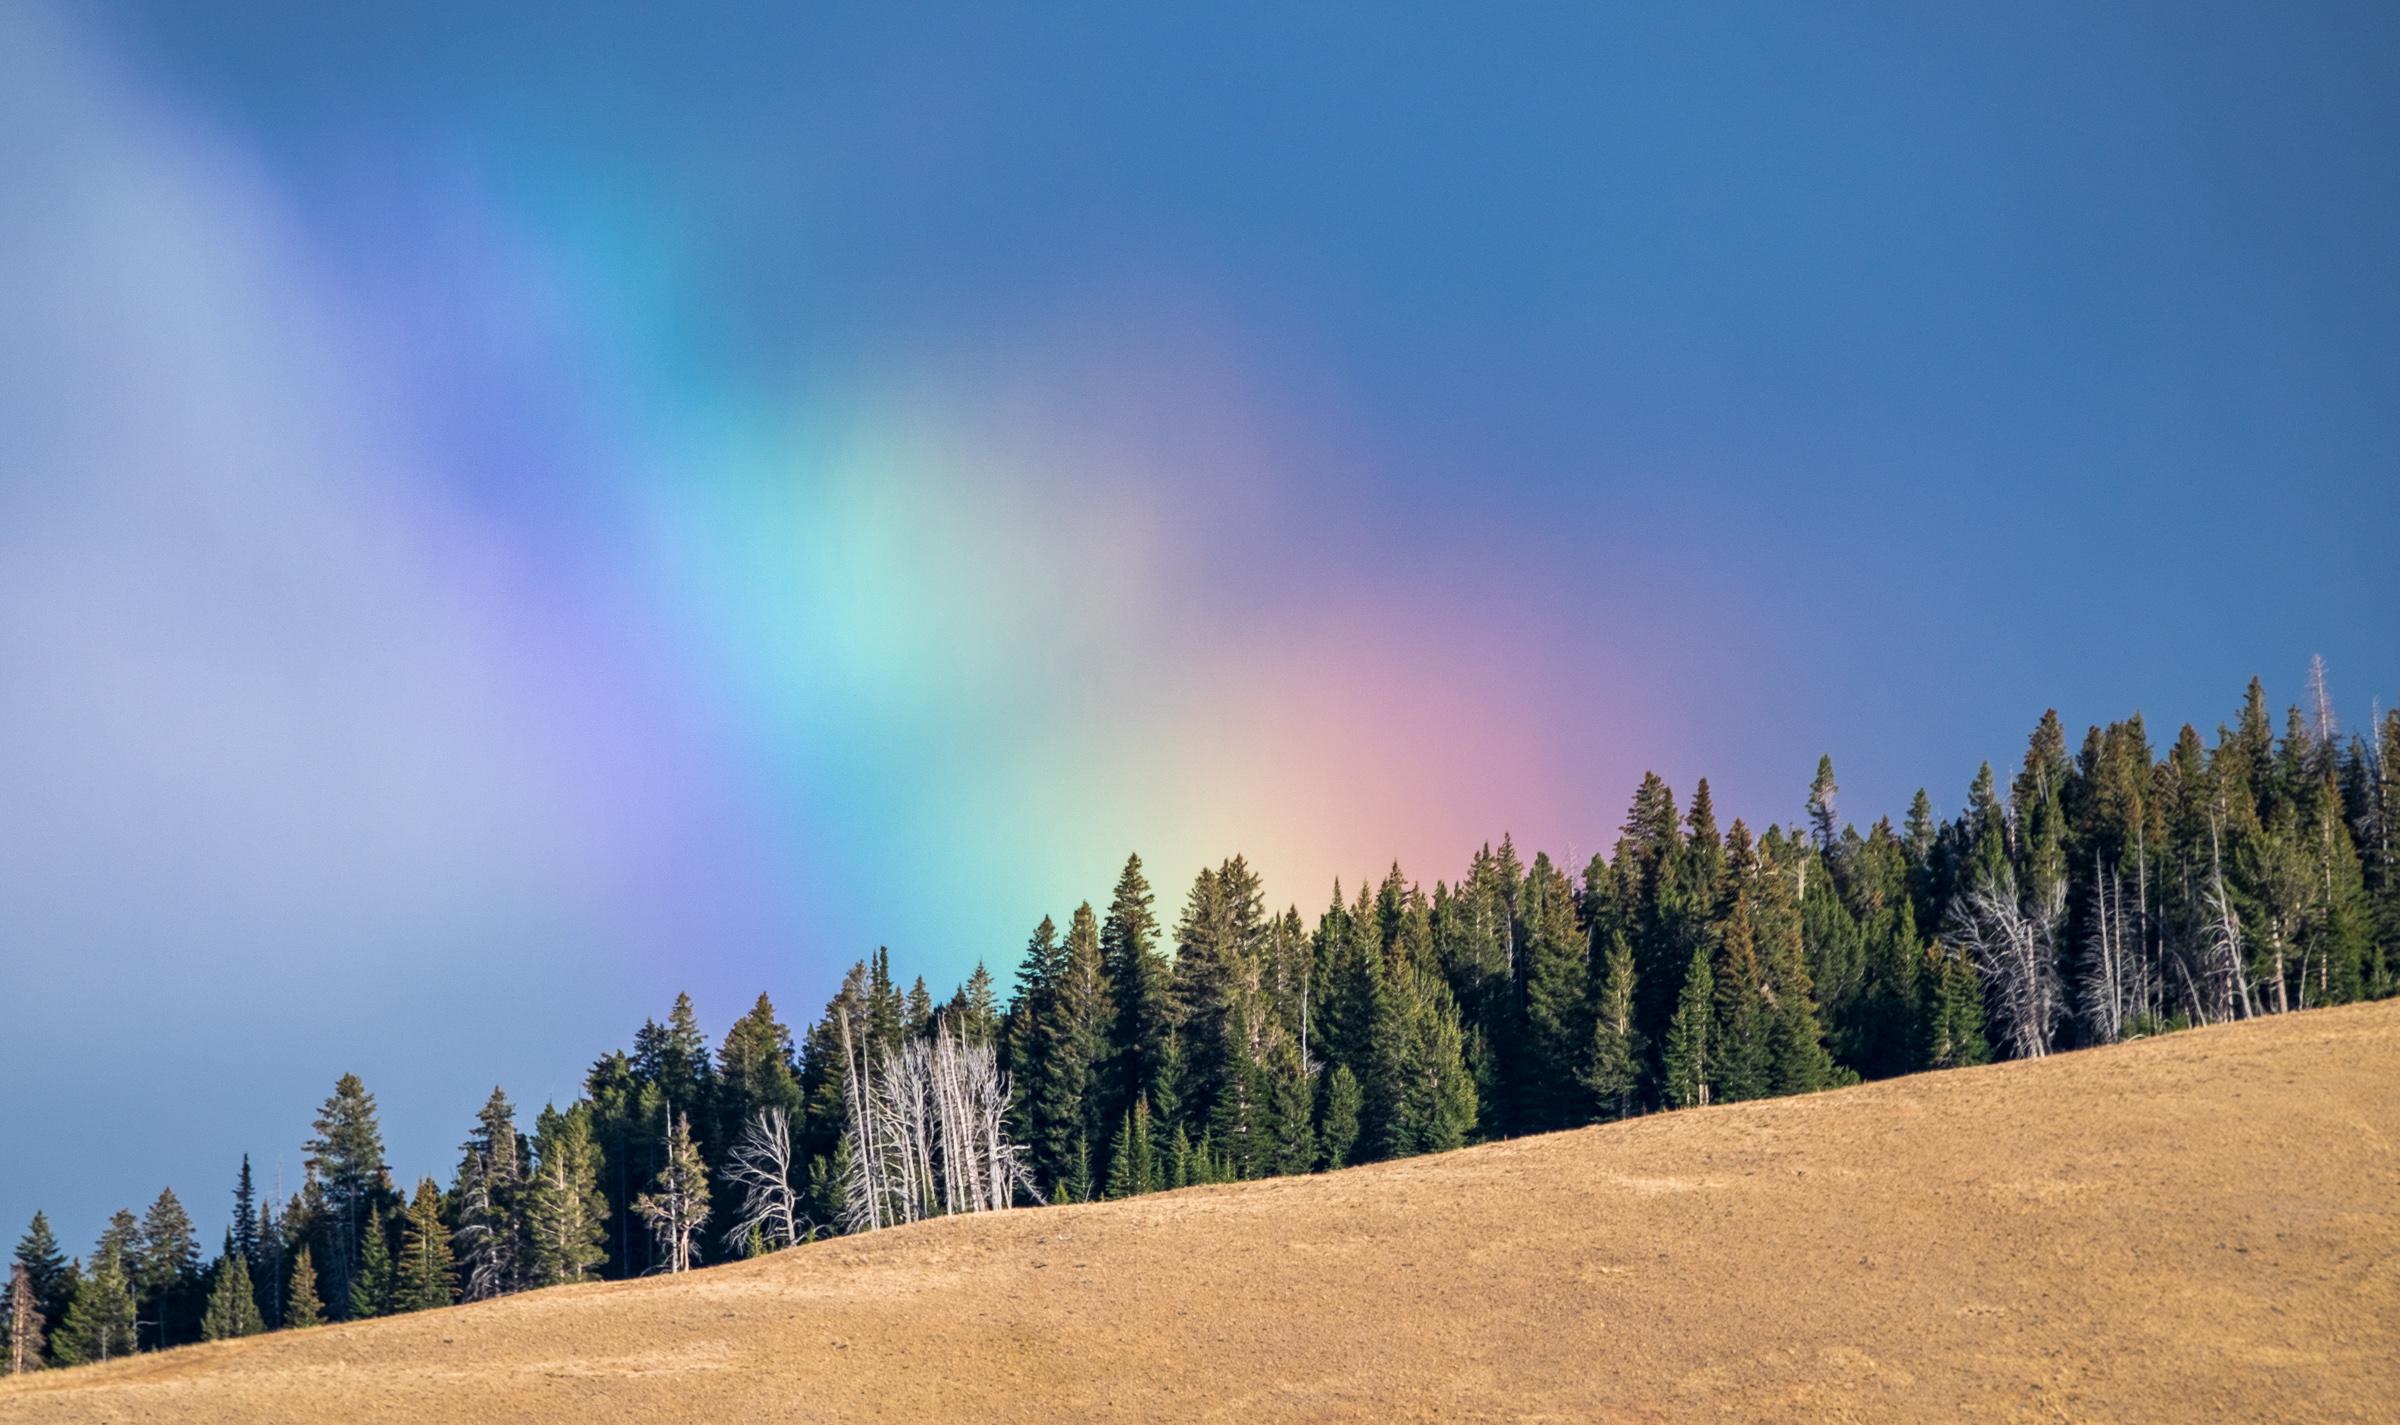 20160919-JI-Yellowstone National Park-_DSF6915-2.jpg